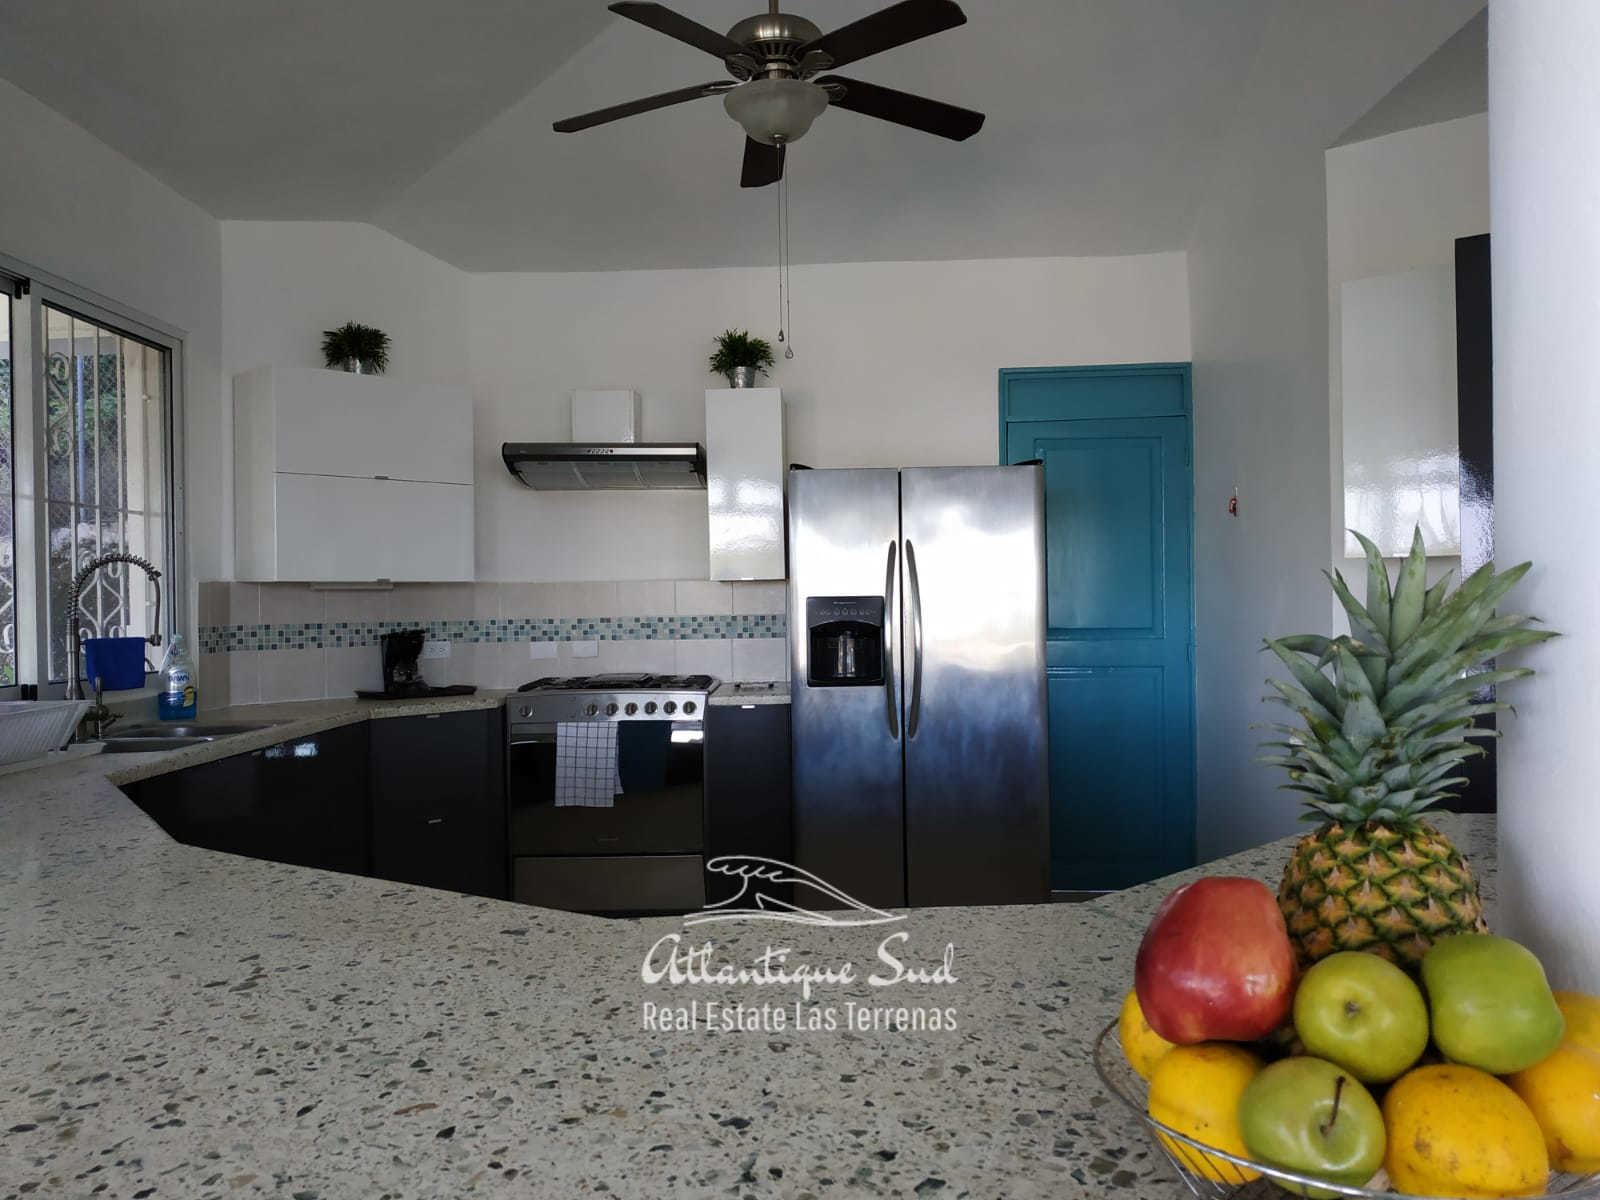 Villa for sale on hill in Las Terrenas Dominican republic35.jpg